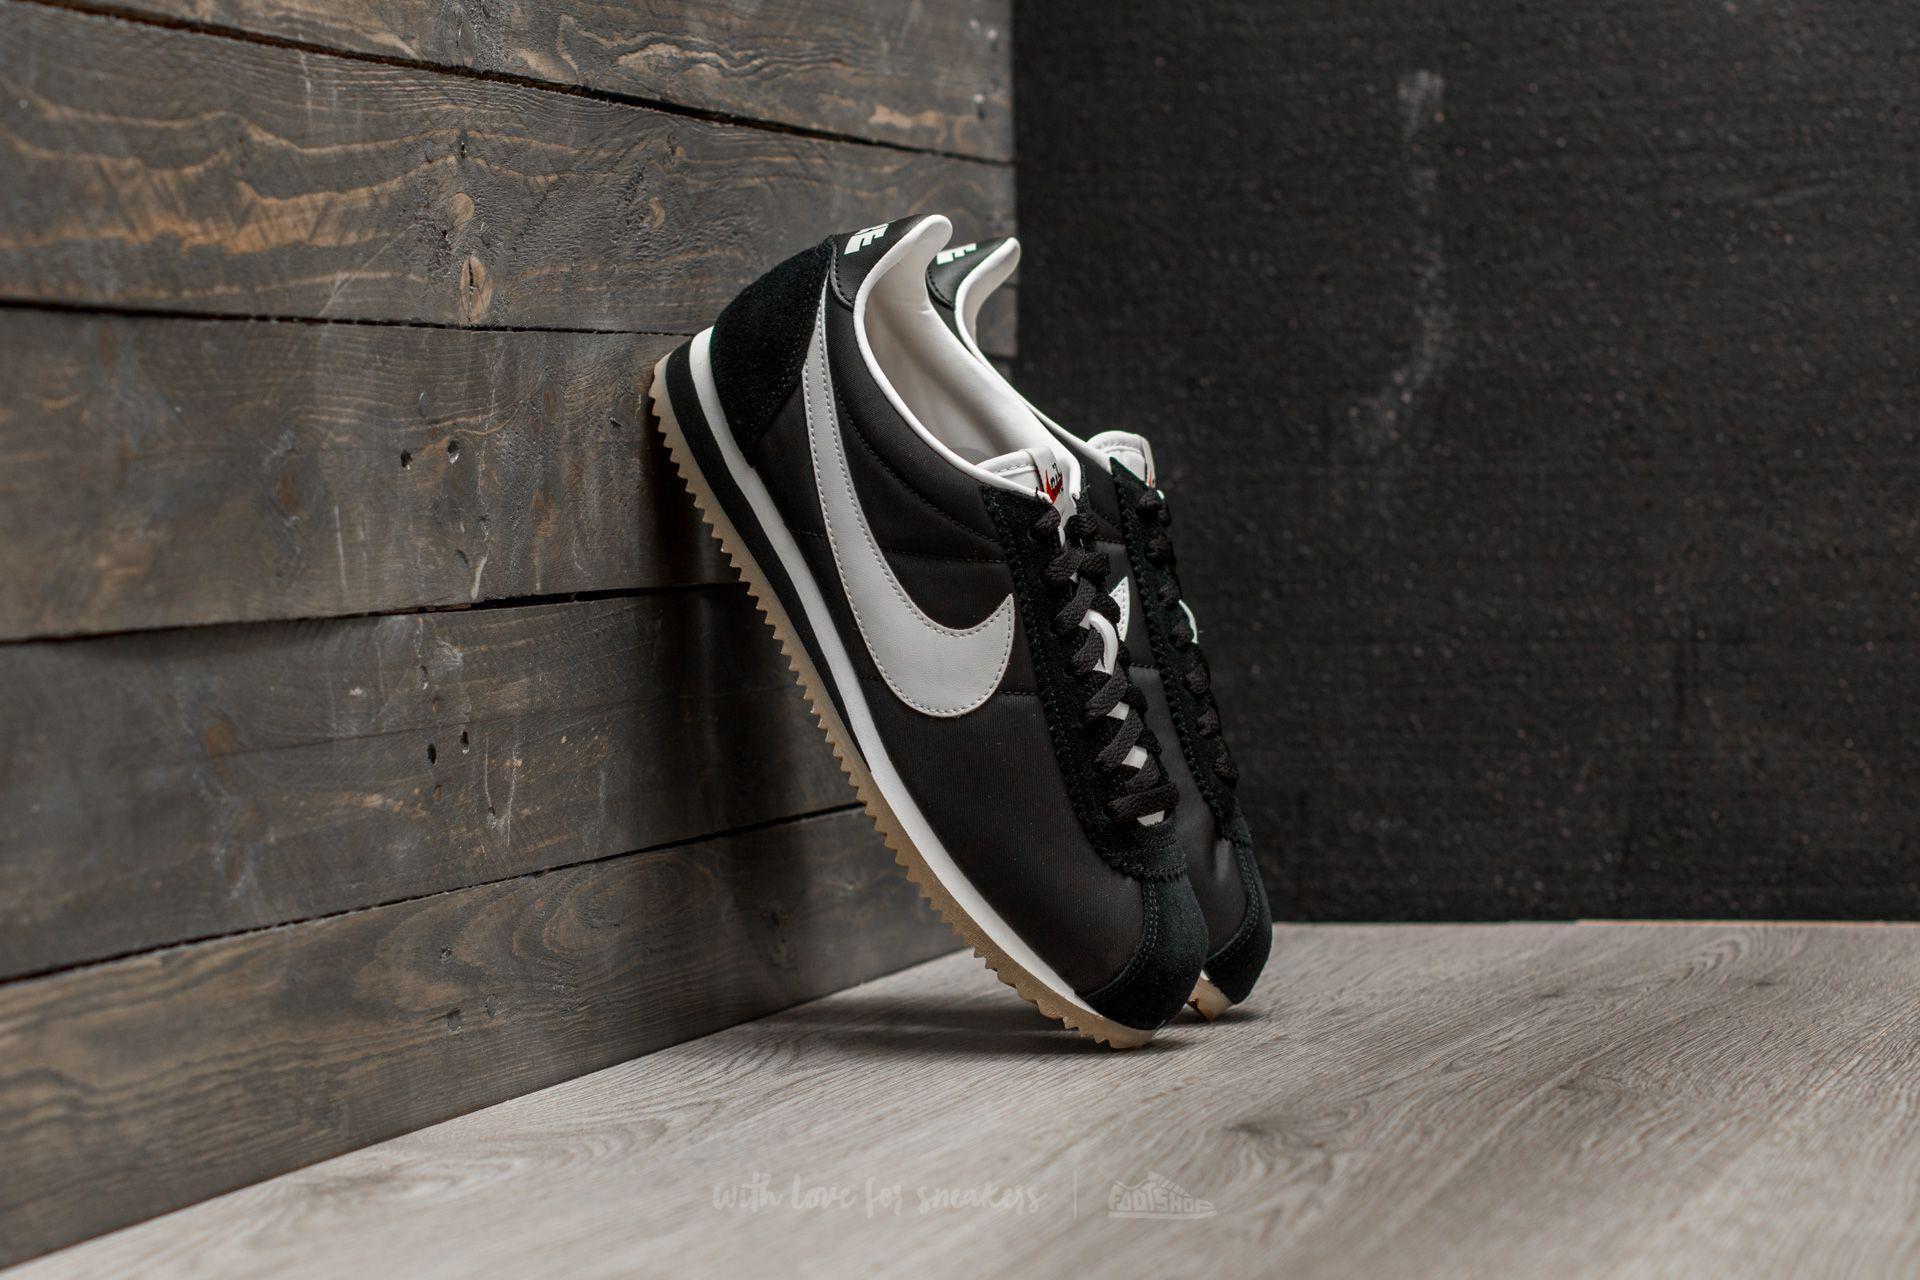 sports shoes 47309 3bf29 Nike Classic Cortez Nylon Premium Black  Sail-gum Light Brown in ...